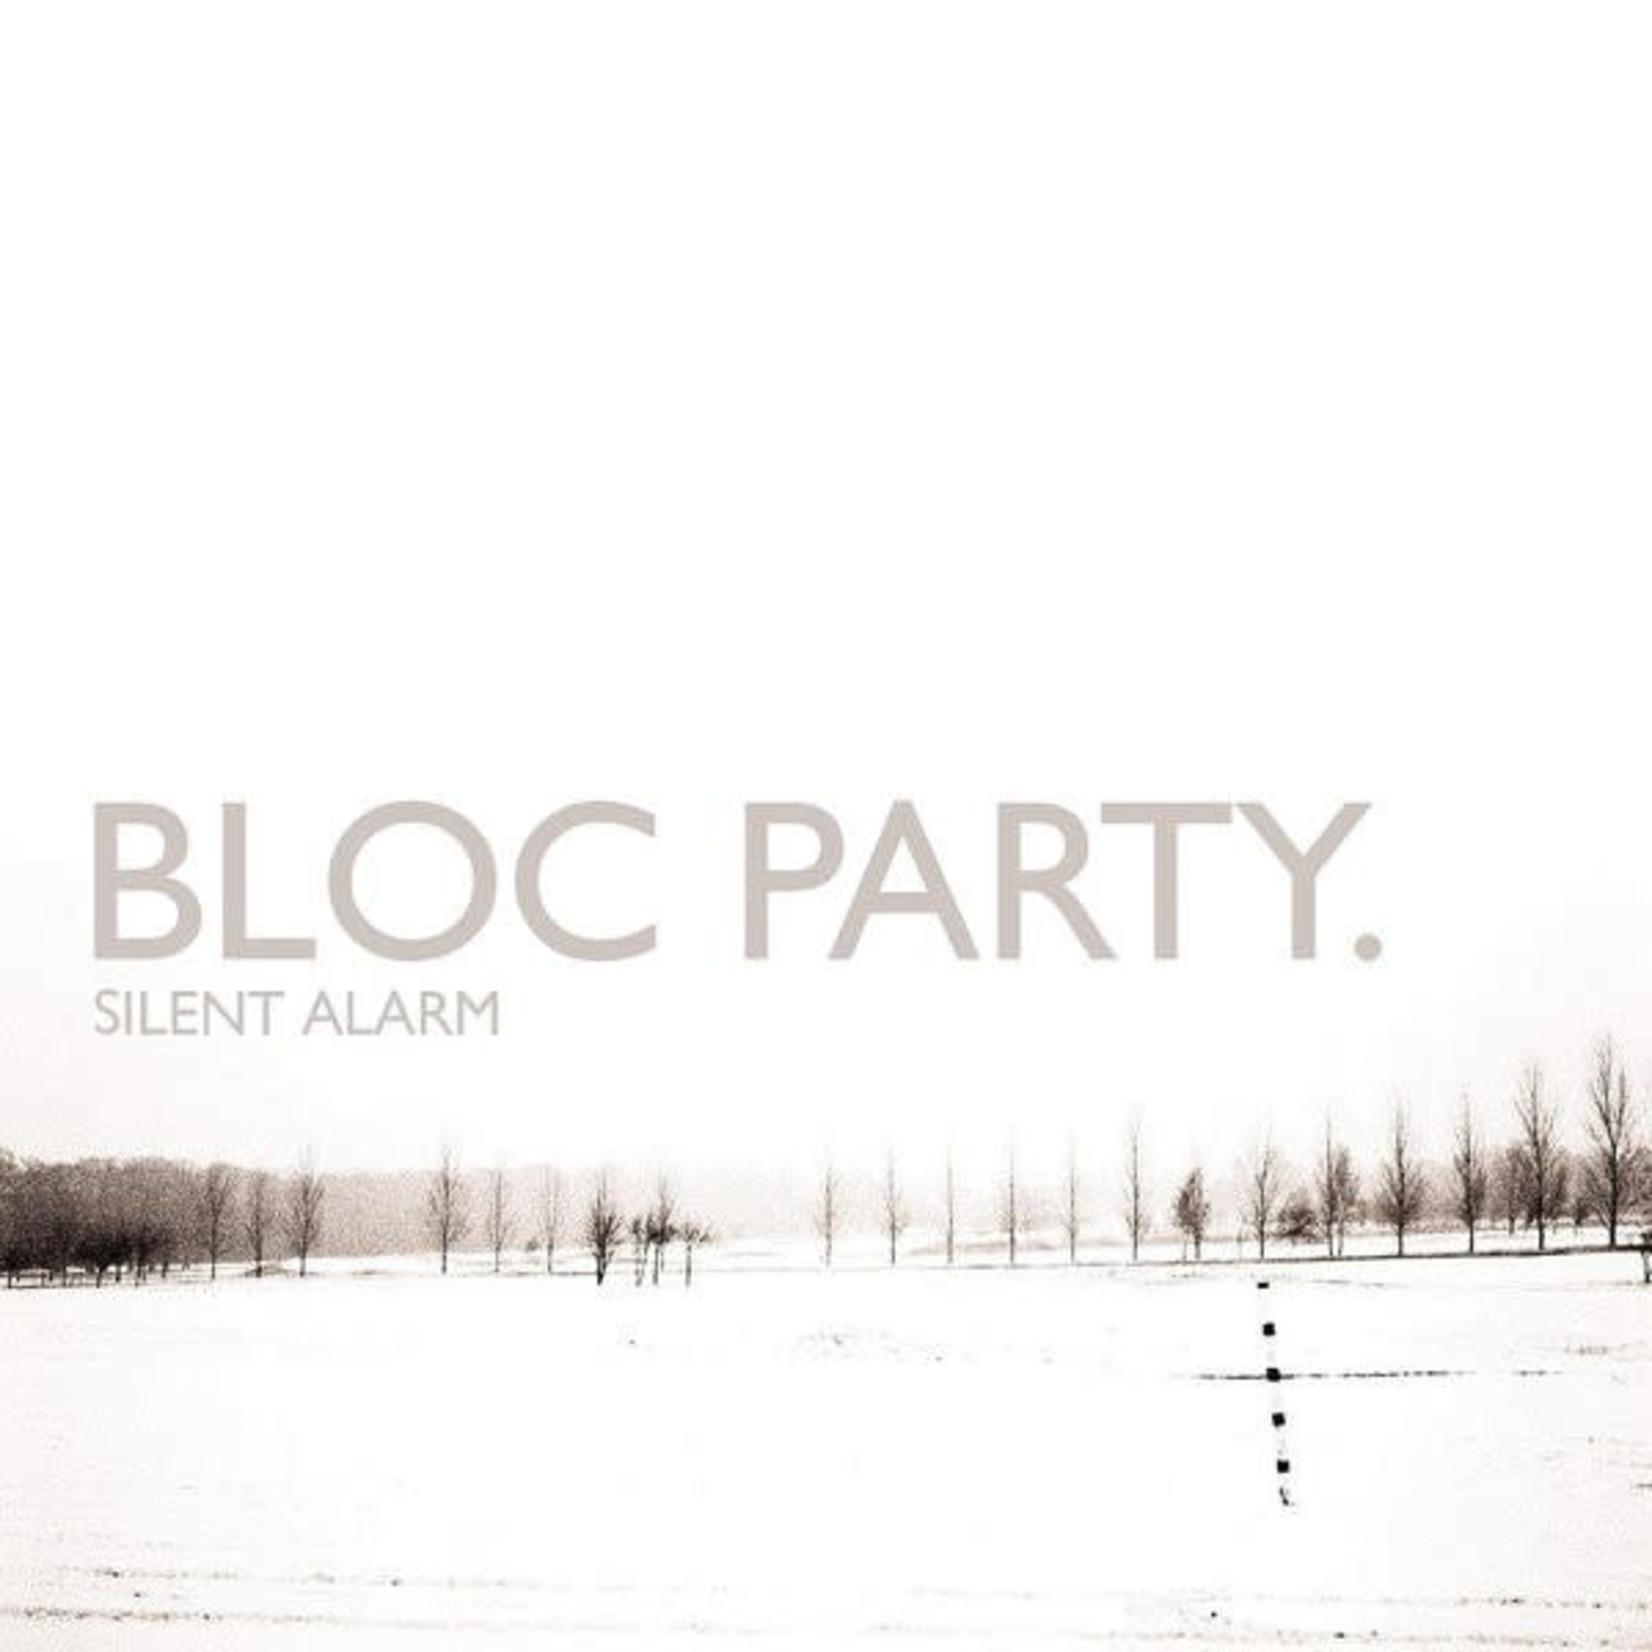 [New] Bloc Party: Silent Alarm